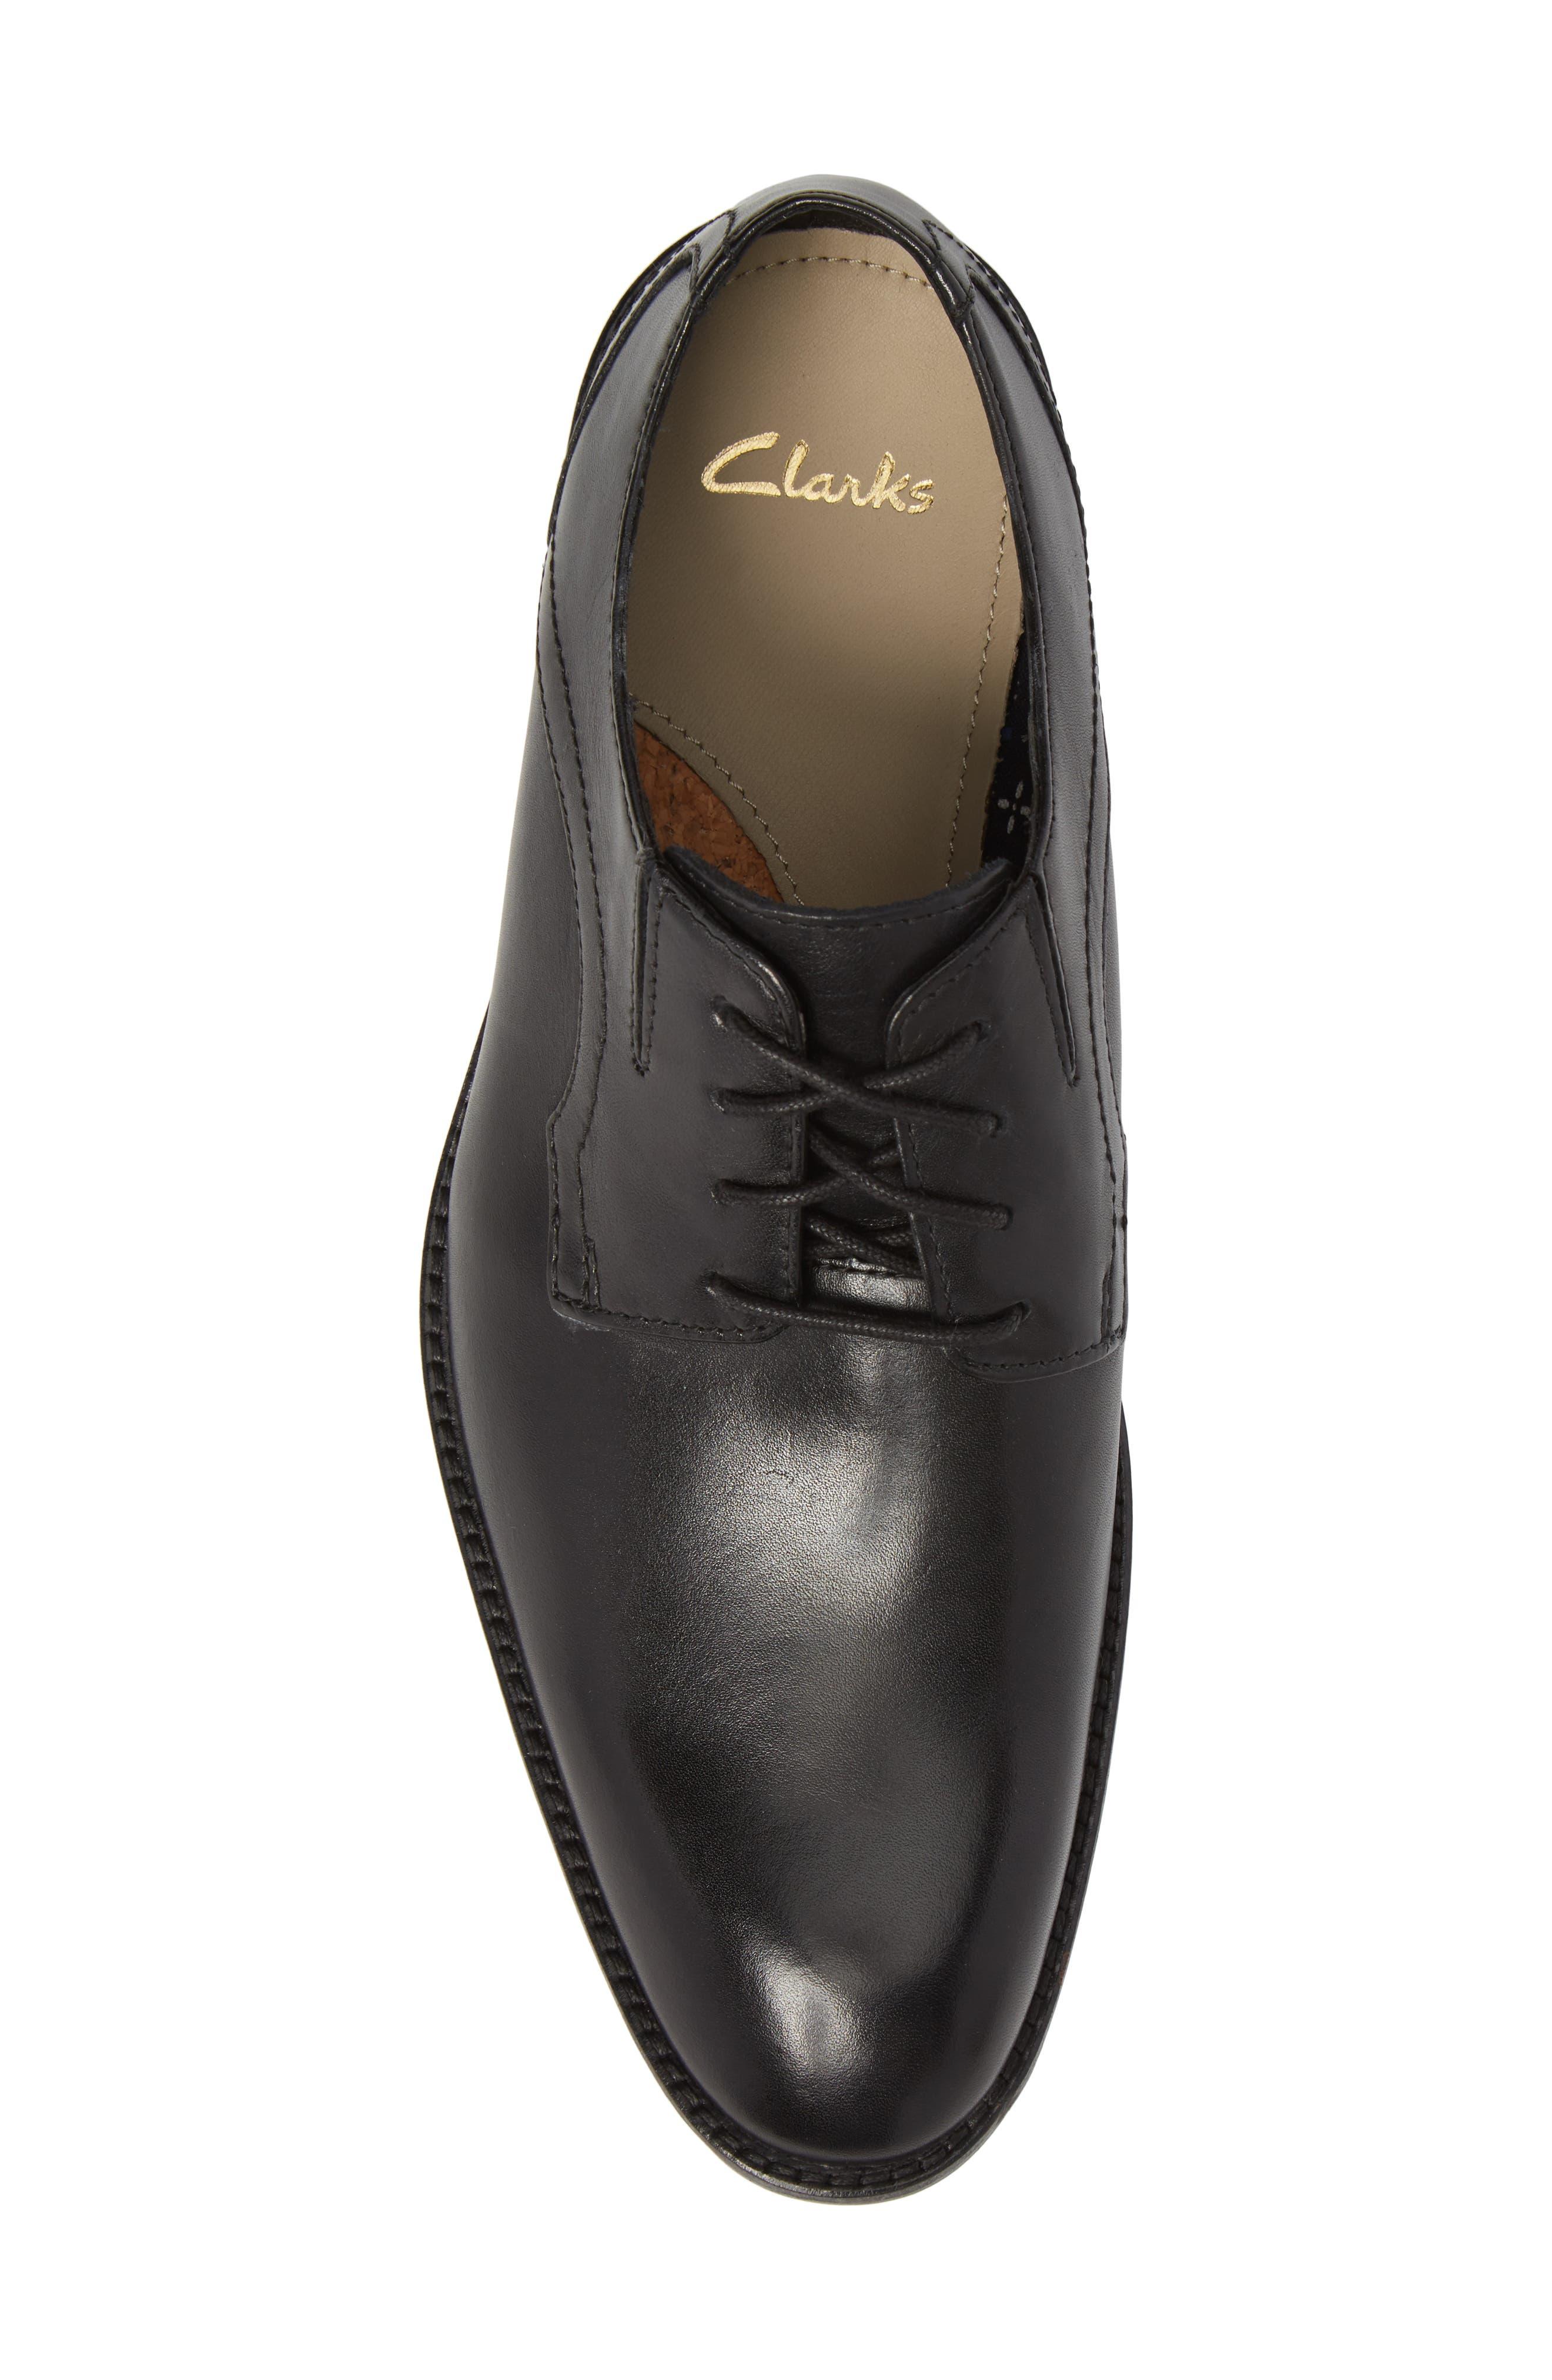 Clarks<sup>®</sup> Prangley Walk Plain Toe Derby,                             Alternate thumbnail 5, color,                             003